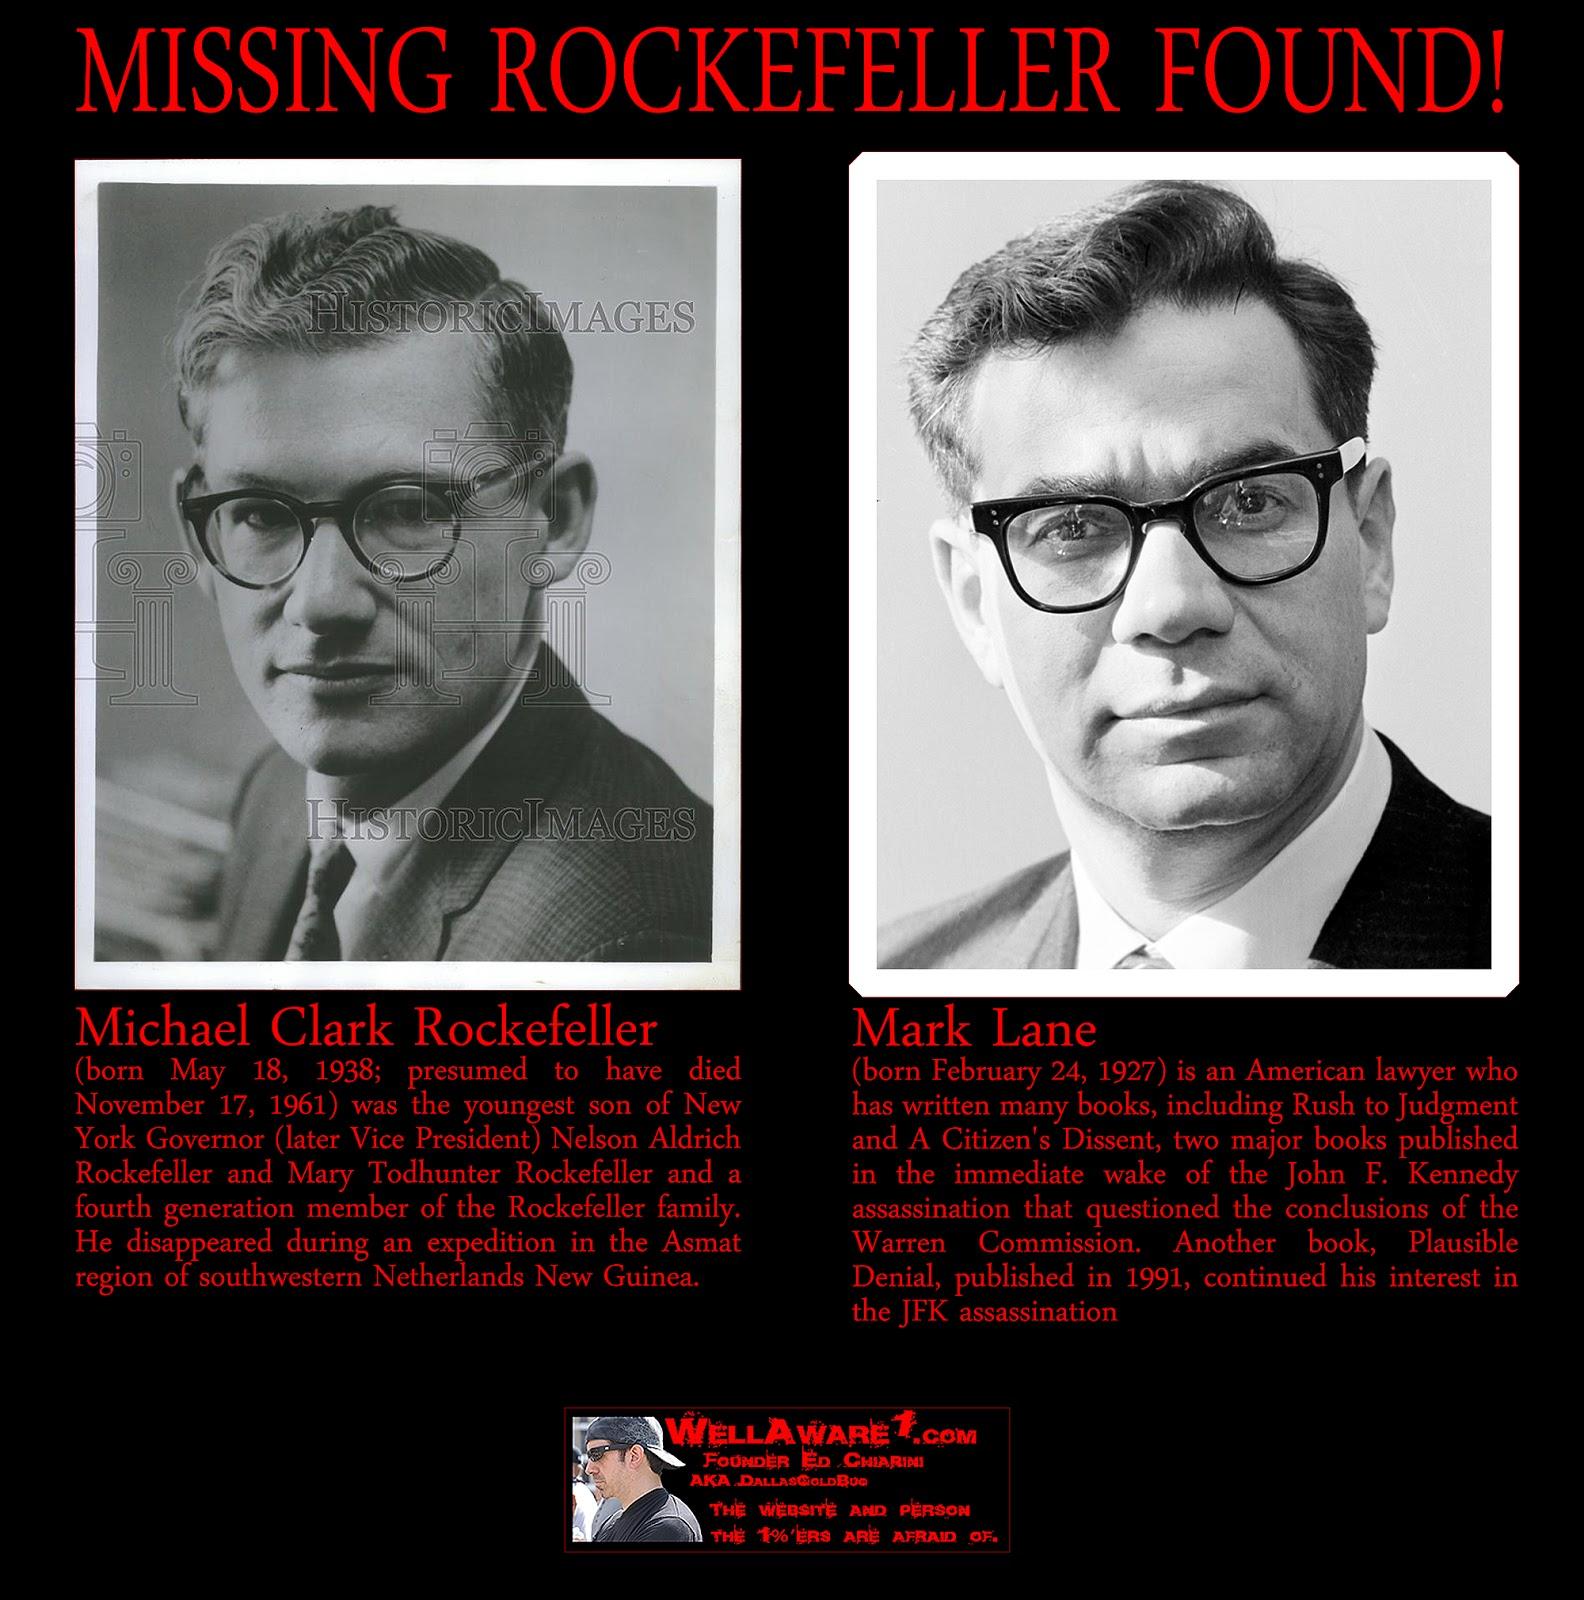 clark rockefeller wikipedia